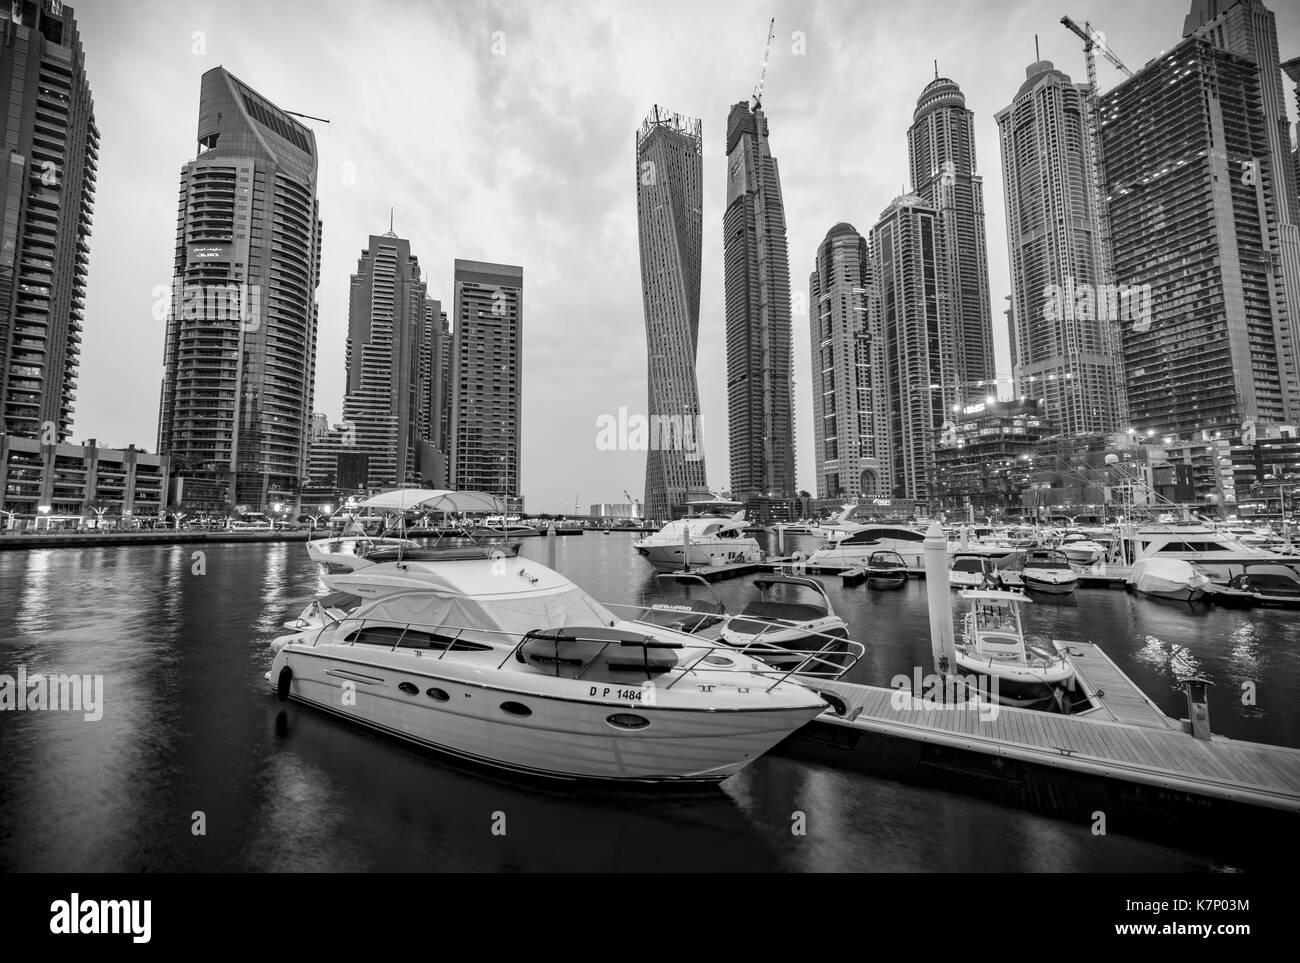 Marina en face des gratte-ciel, la marina de Dubaï, Dubaï, Émirats arabes unis Photo Stock